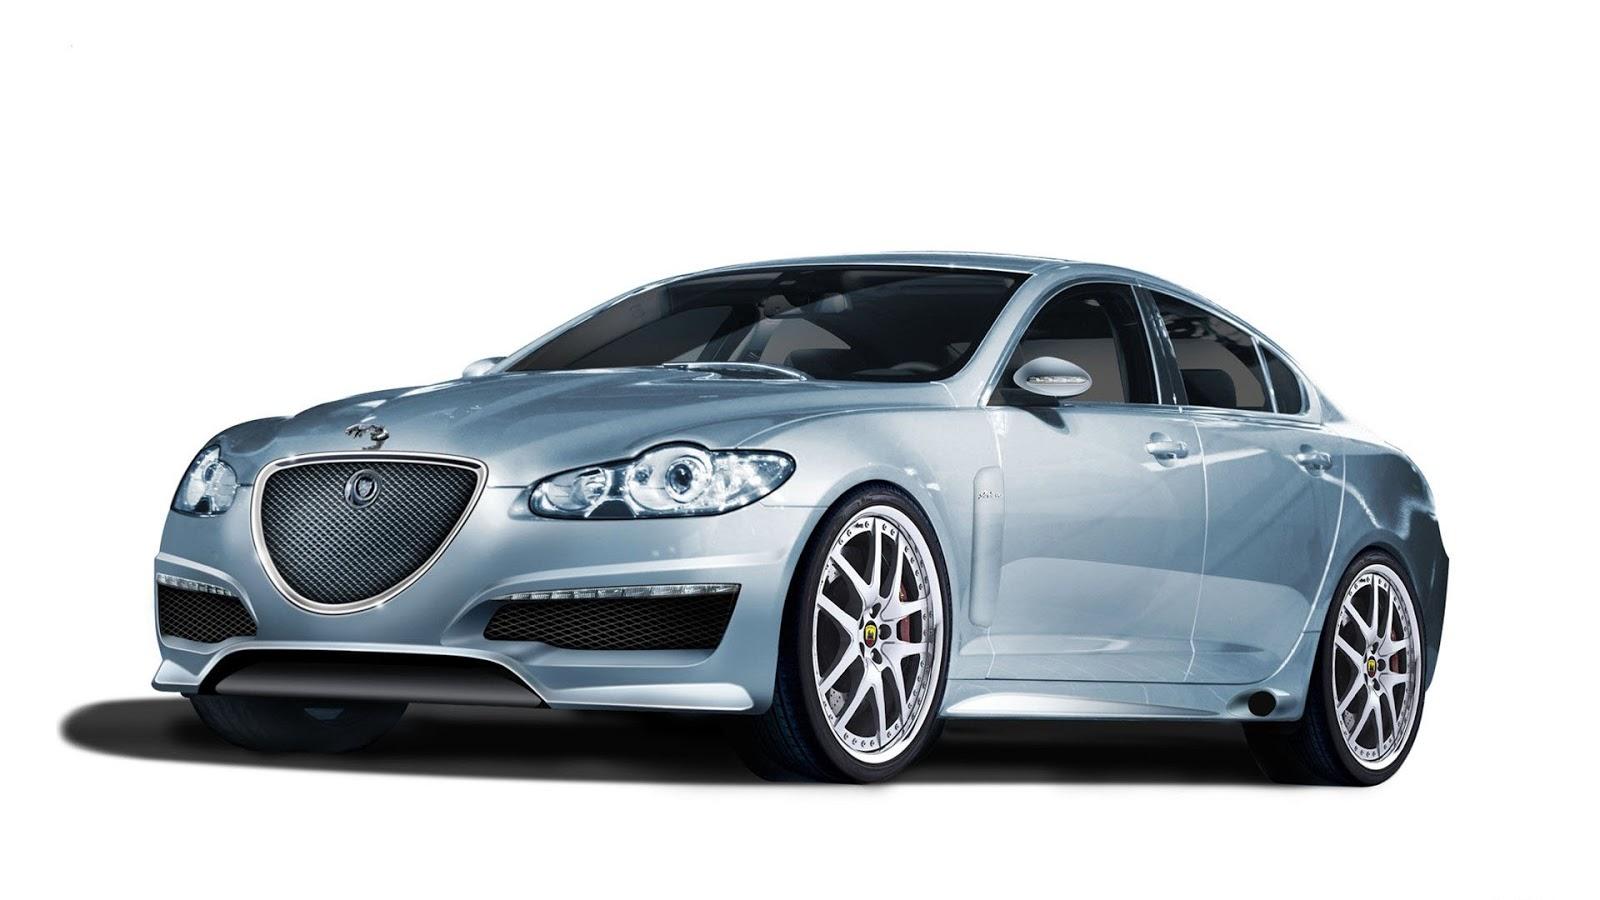 medium resolution of autoparts and accesories for jaguar rh car parts world com jaguar parts diagram jaguar illustration